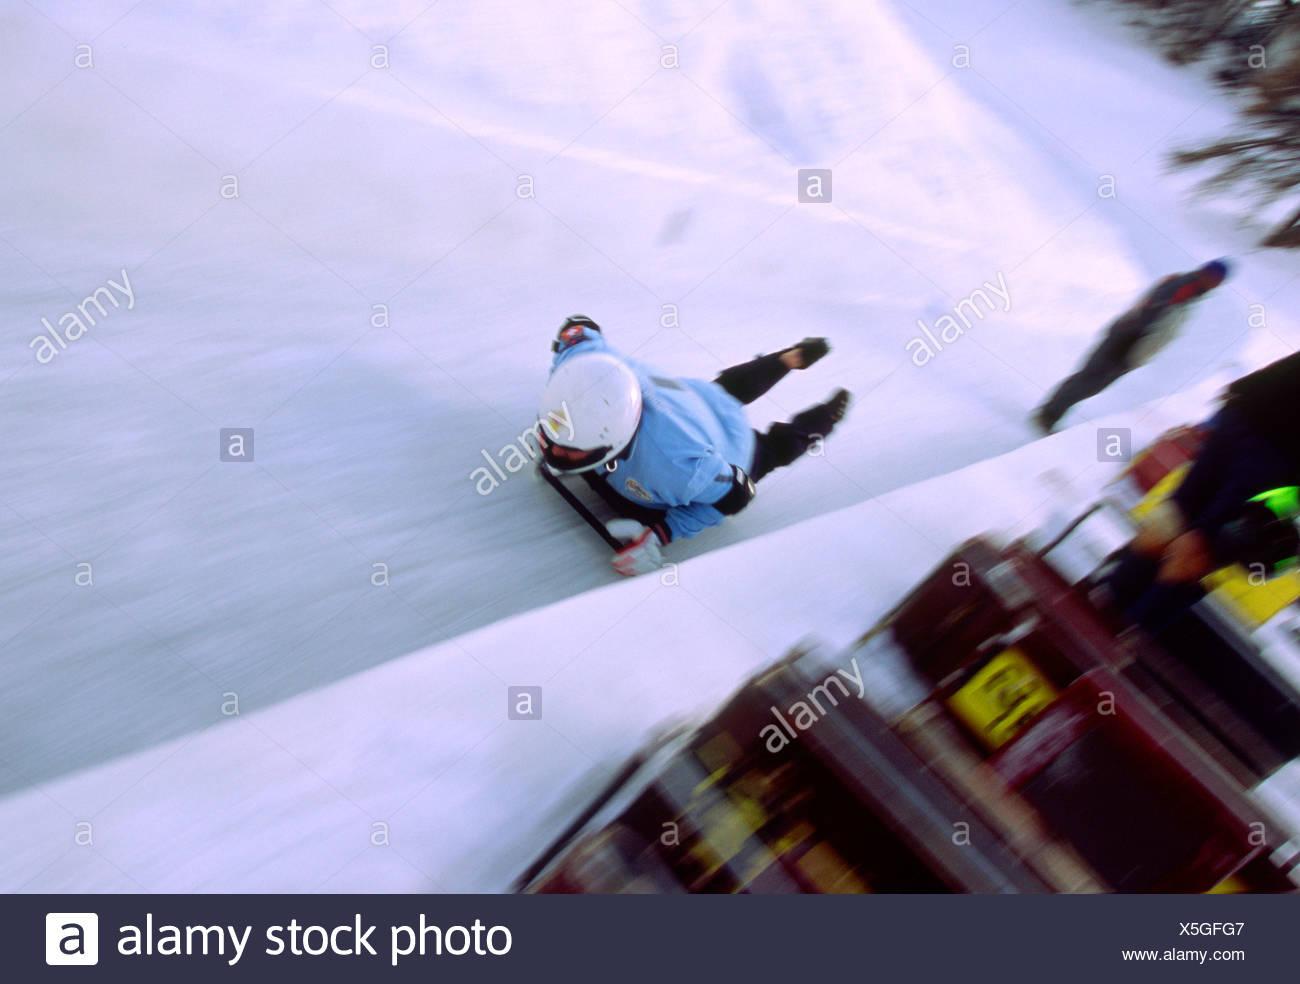 8366b6c431165 Bobsleigh St Moritz Stock Photos & Bobsleigh St Moritz Stock Images ...